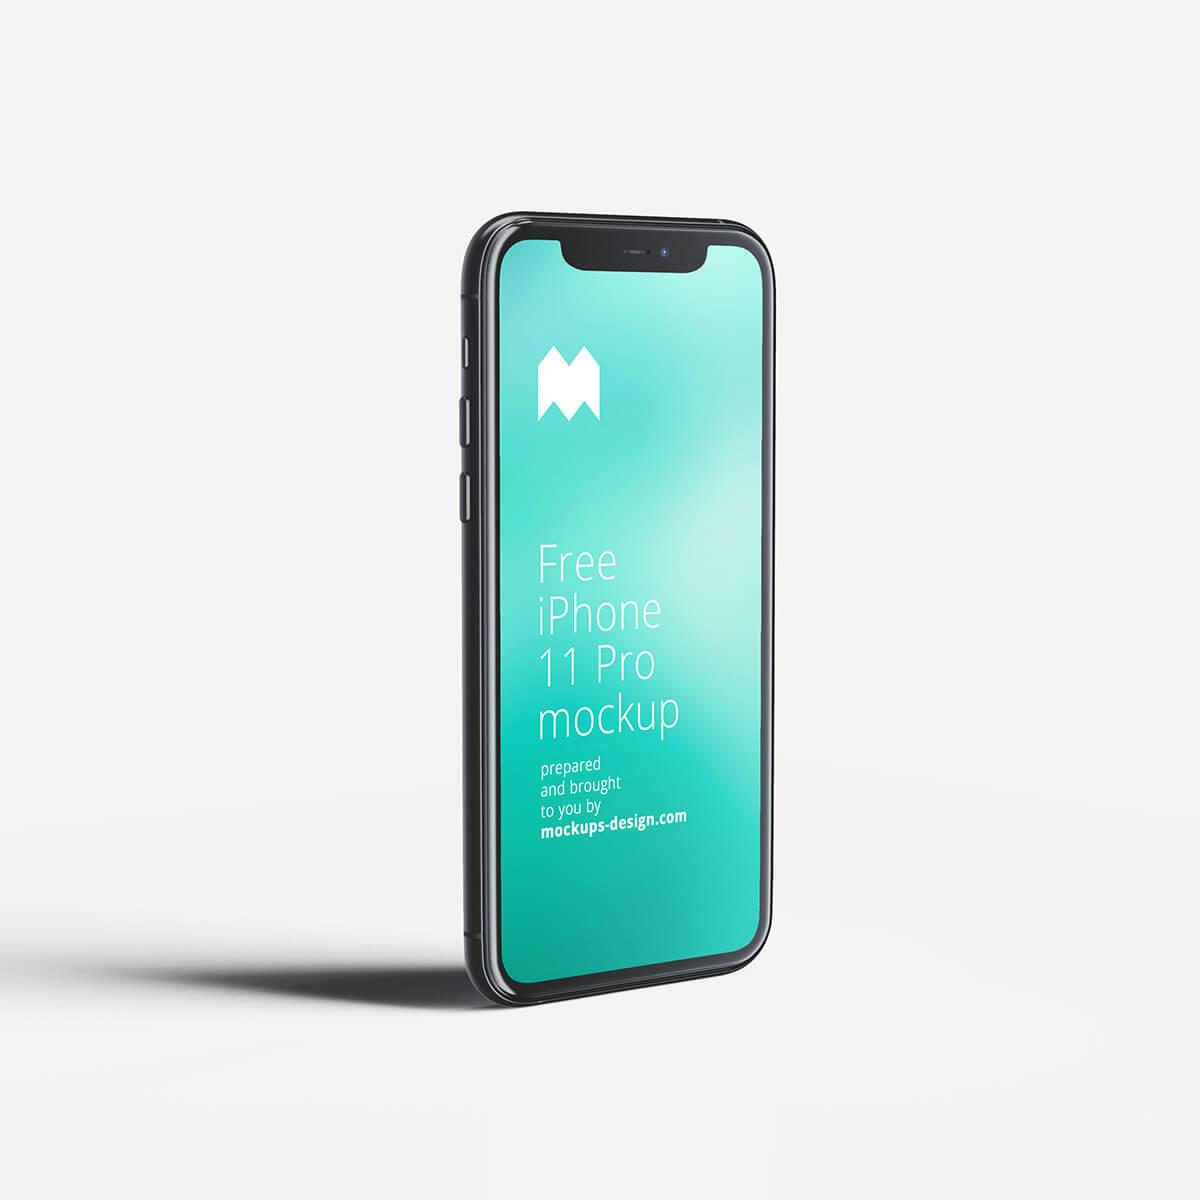 Free Revolutionary iPhone 11 Pro Mockup PSD Template